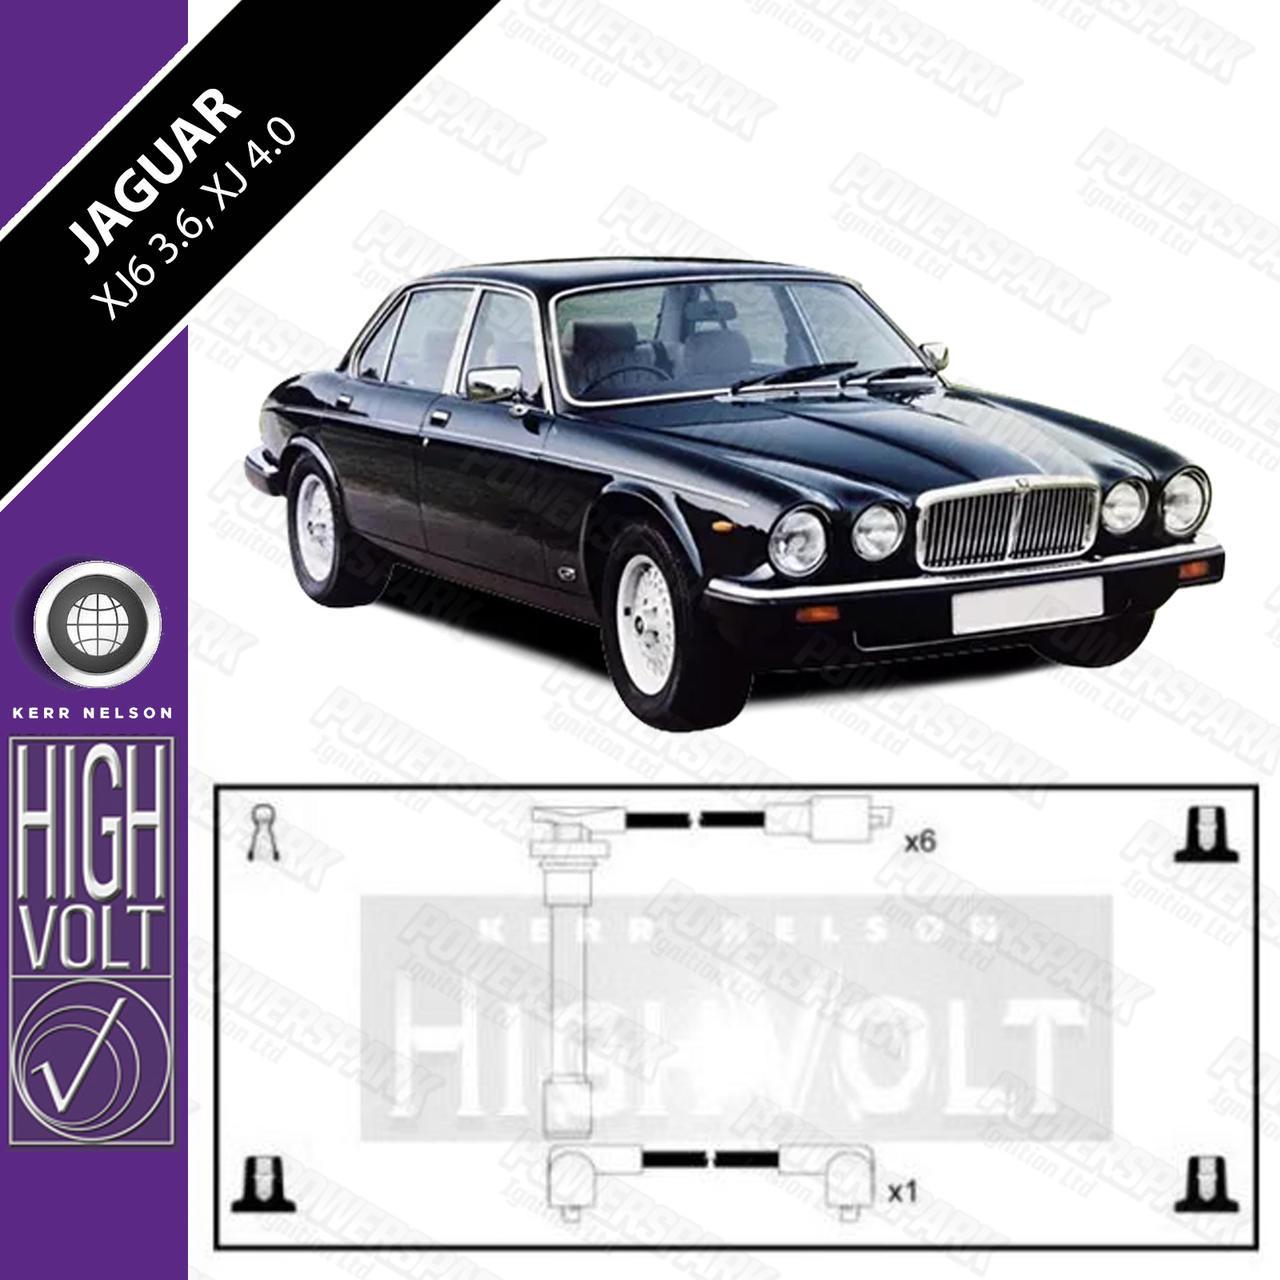 High Volt Jaguar XJ6 3.6 and Jaguar XJ 4.0 High Volt HT Leads OEF318